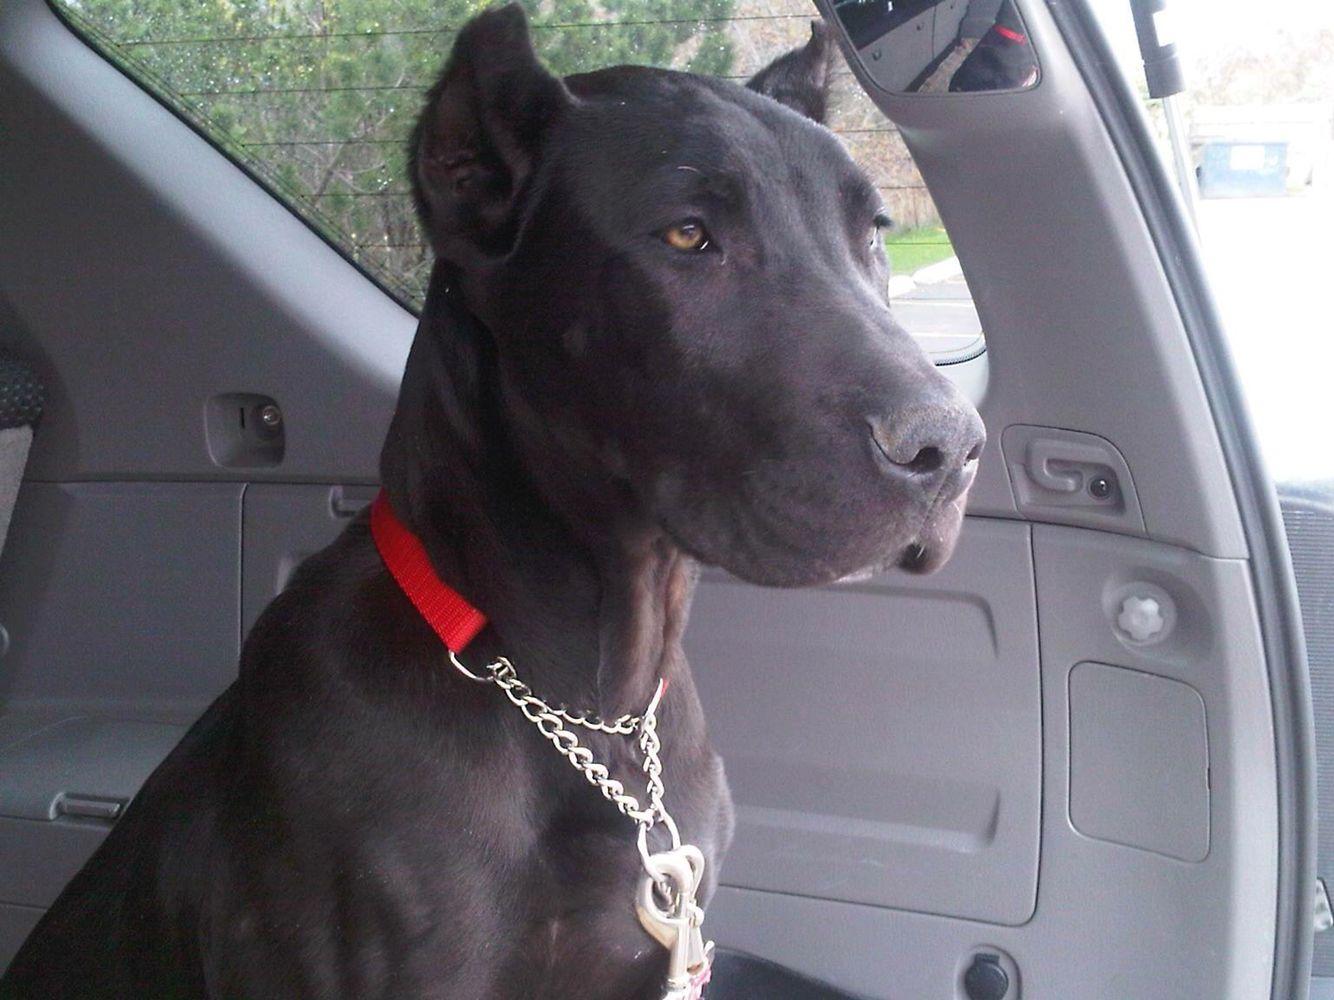 Donovan Pinscher Aka Canis Panther Favorite Dog Breeds